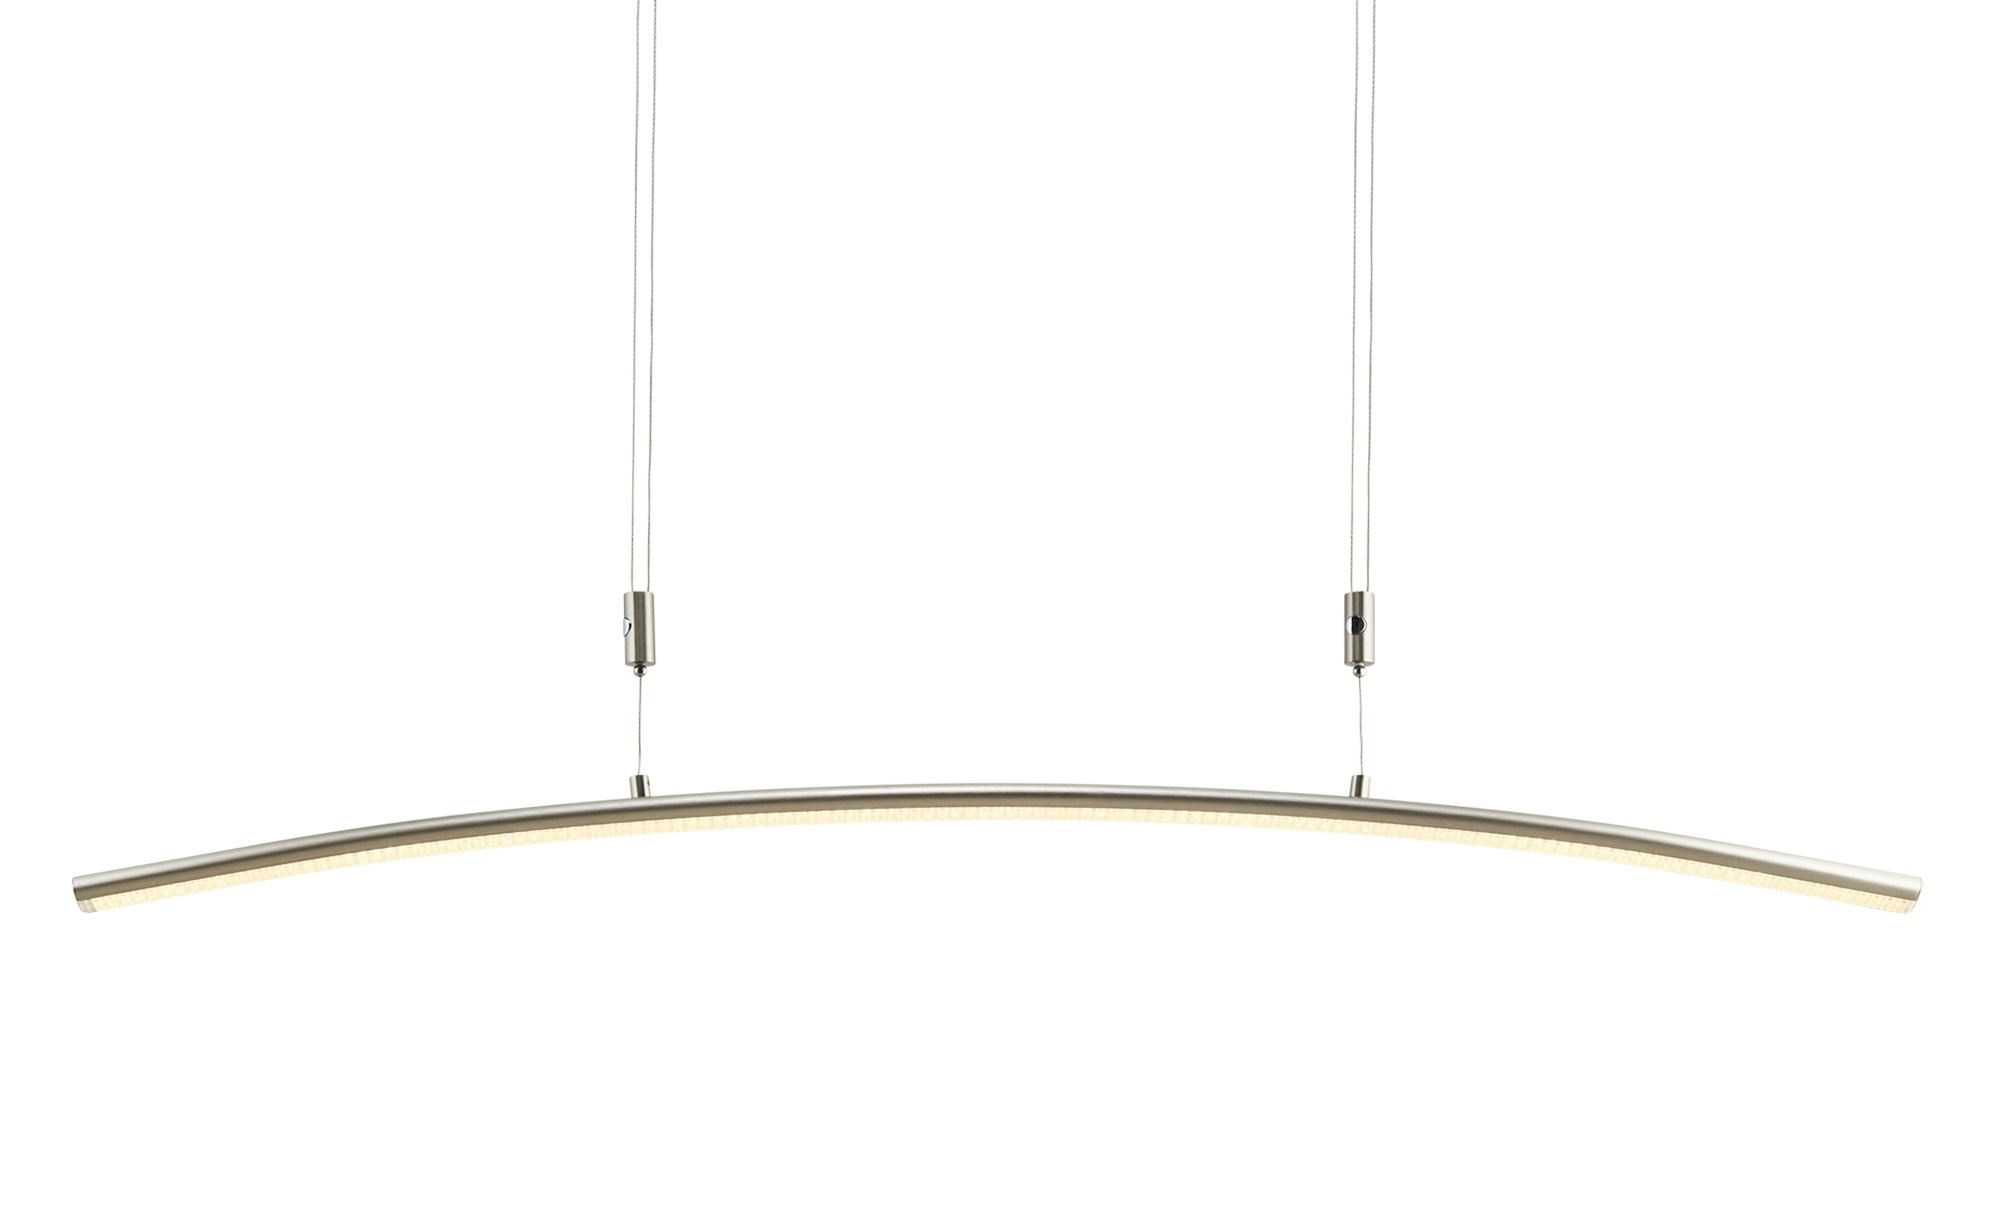 KHG LED-Pendelleuchte, Nickel matt ¦ silber ¦ Maße (cm): B: 5,8 H: 120 Lampen & Leuchten > Innenleuchten > Pendelleuchten - Höffner